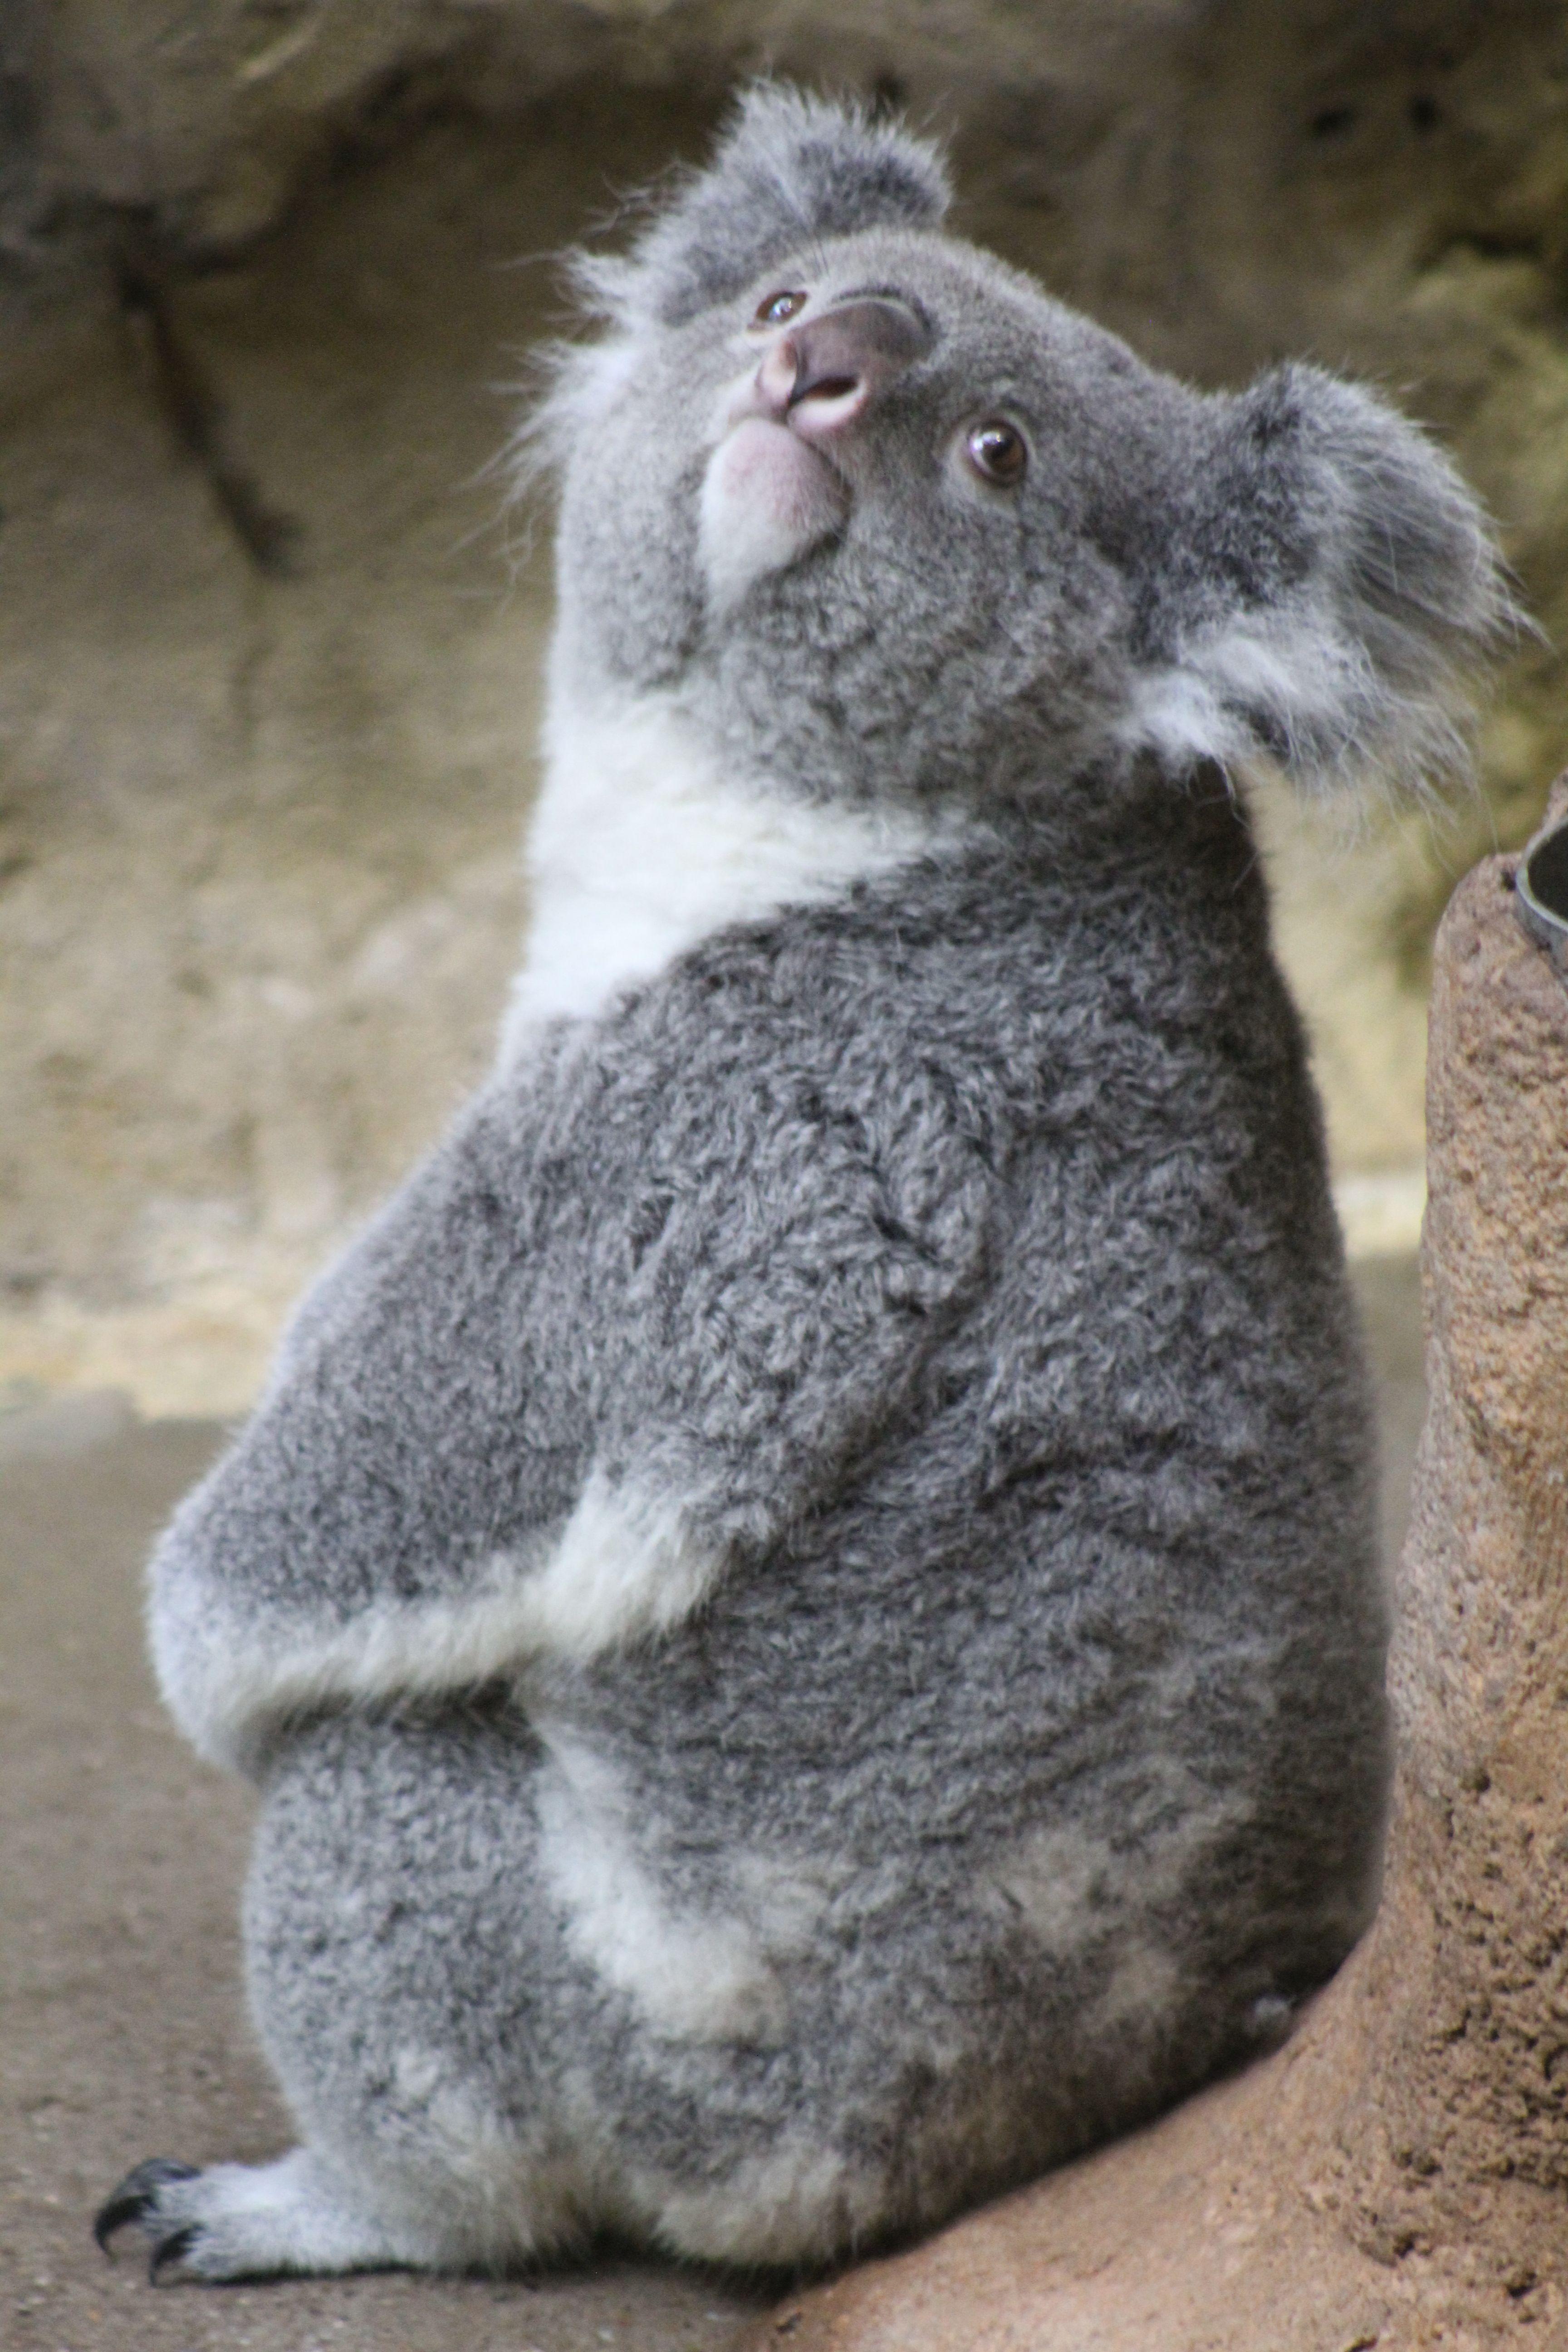 Yiribana Is Curious Animais Silvestres Imagens De Animais Coalas